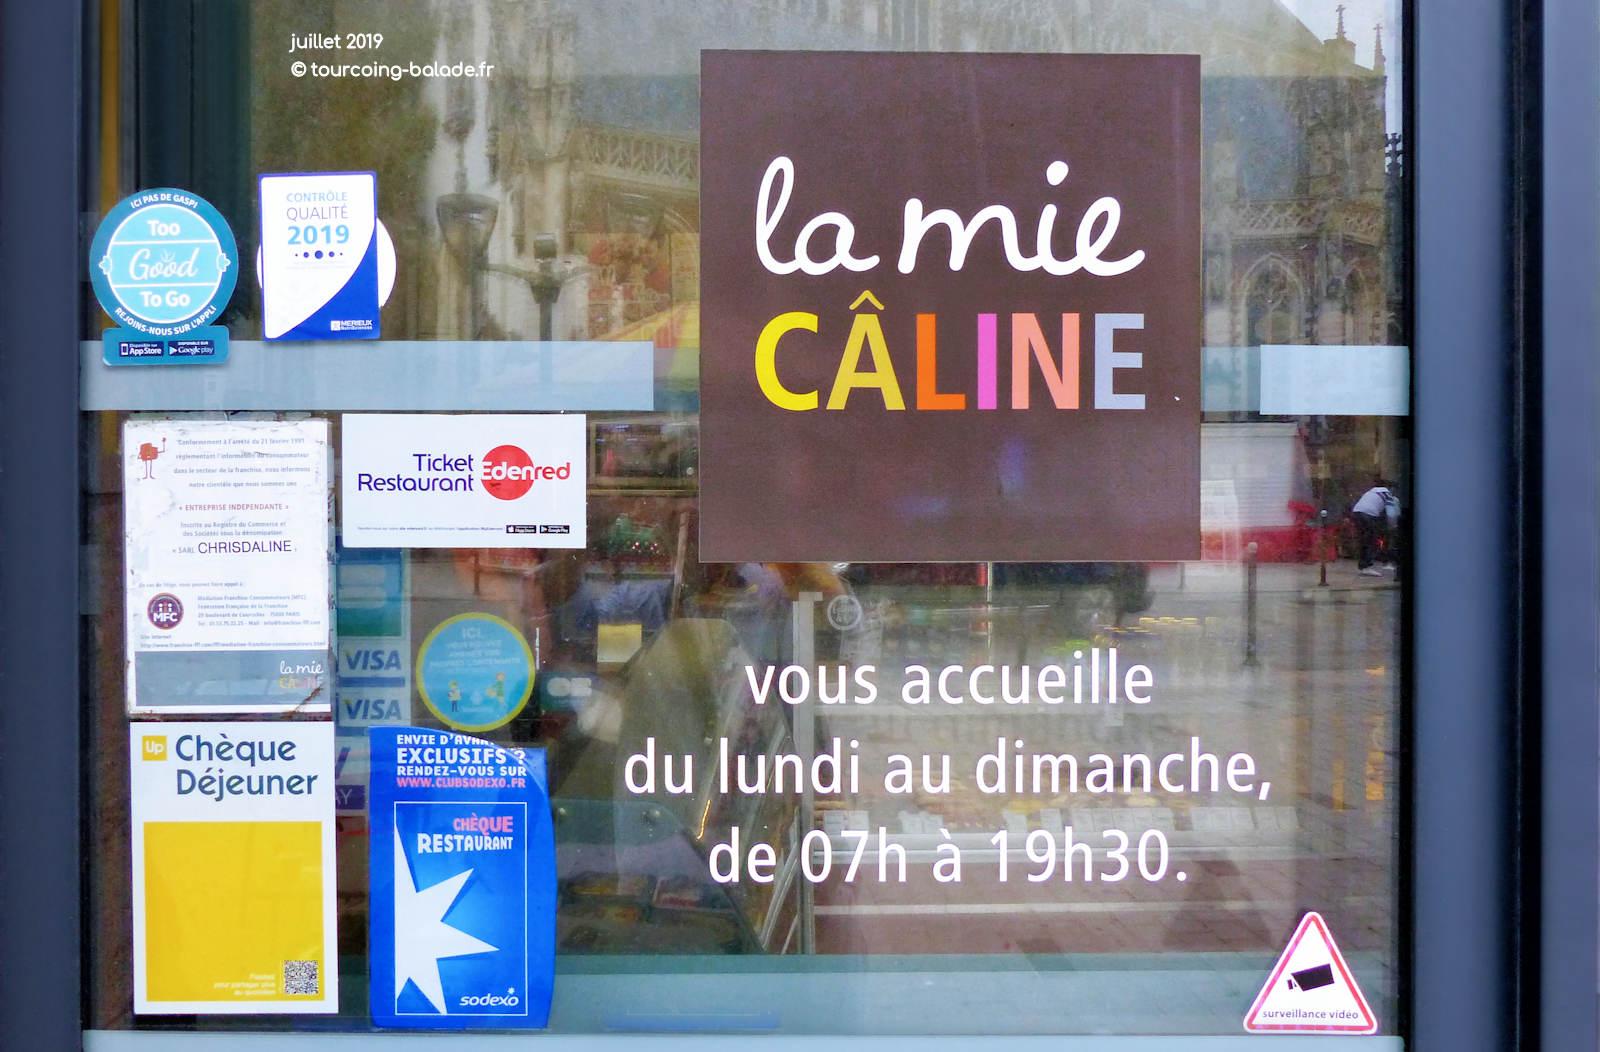 Horaires d'ouverture - Mie Caline, Tourcoing centre